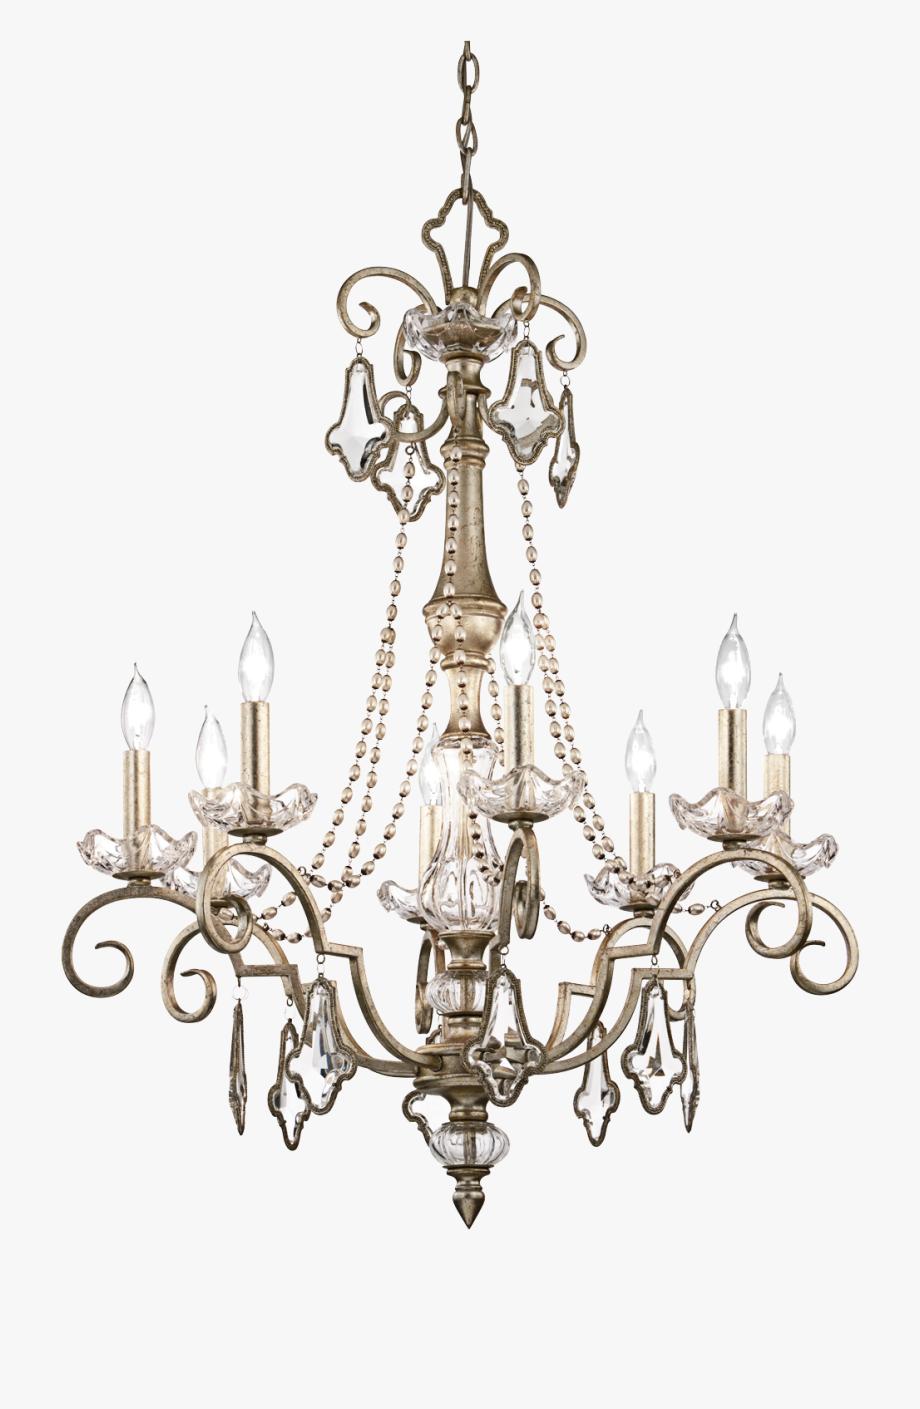 jpg freeuse library Light fixture lighting pendant. Chandelier clipart file.